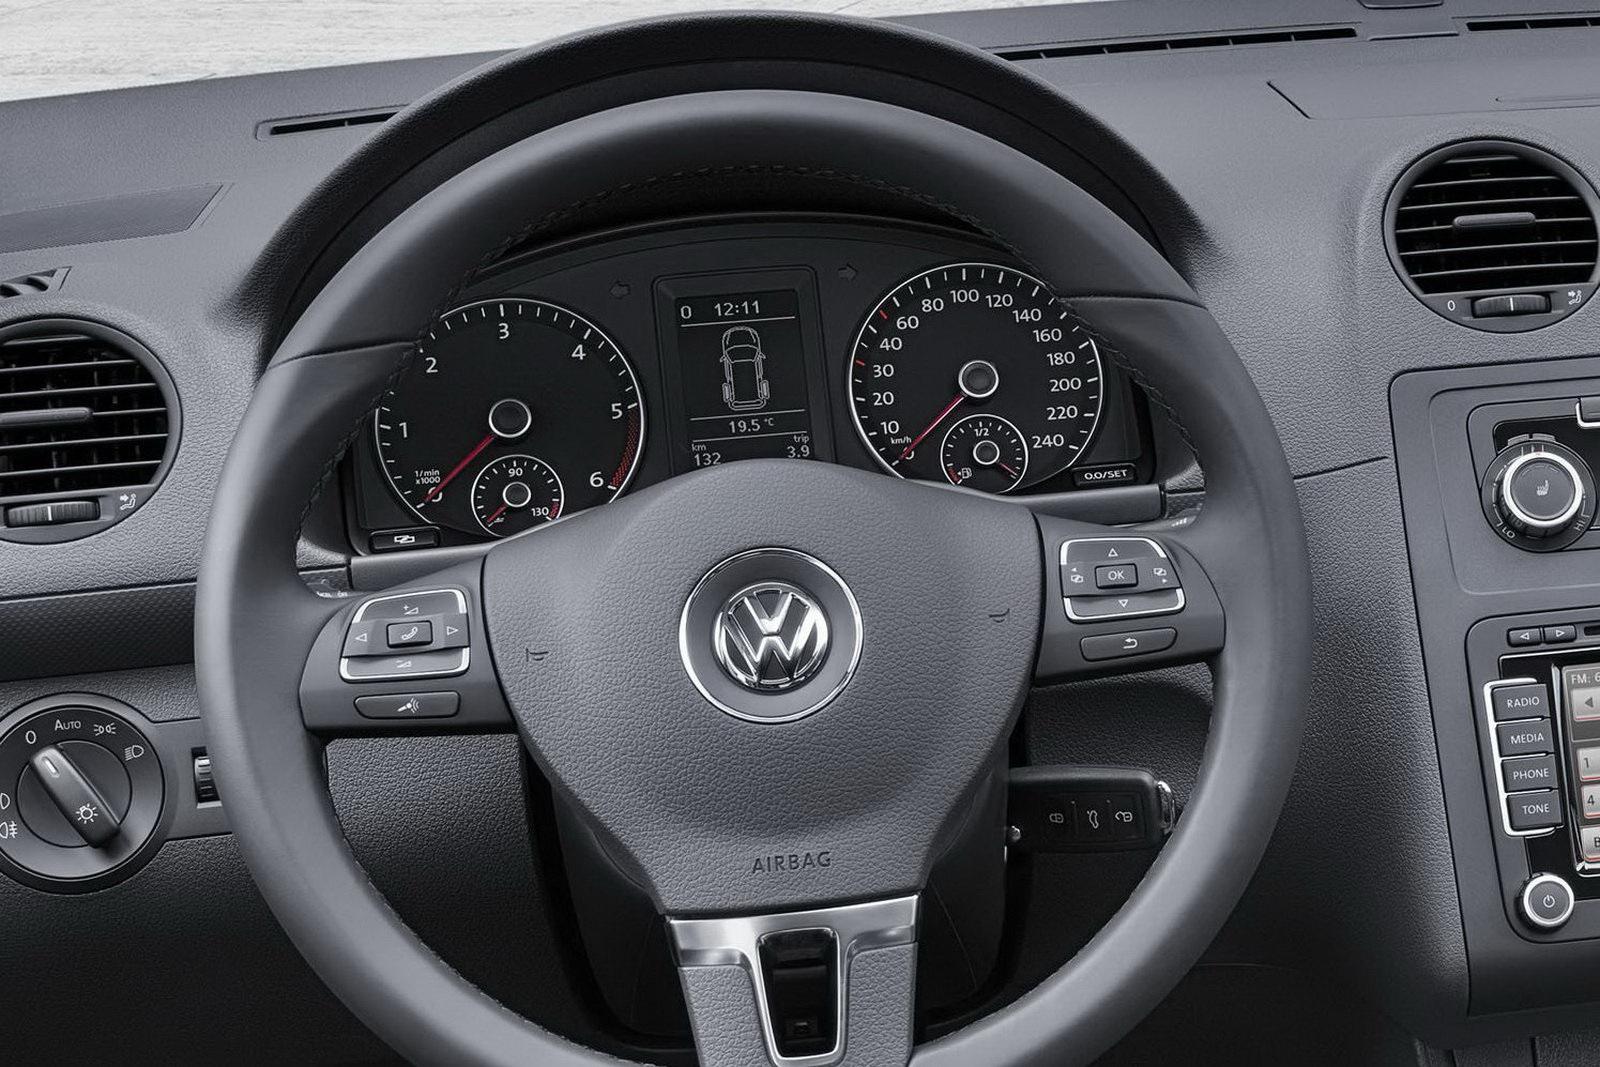 volkswagen caddy facelift 2010 volkswagen autopareri. Black Bedroom Furniture Sets. Home Design Ideas